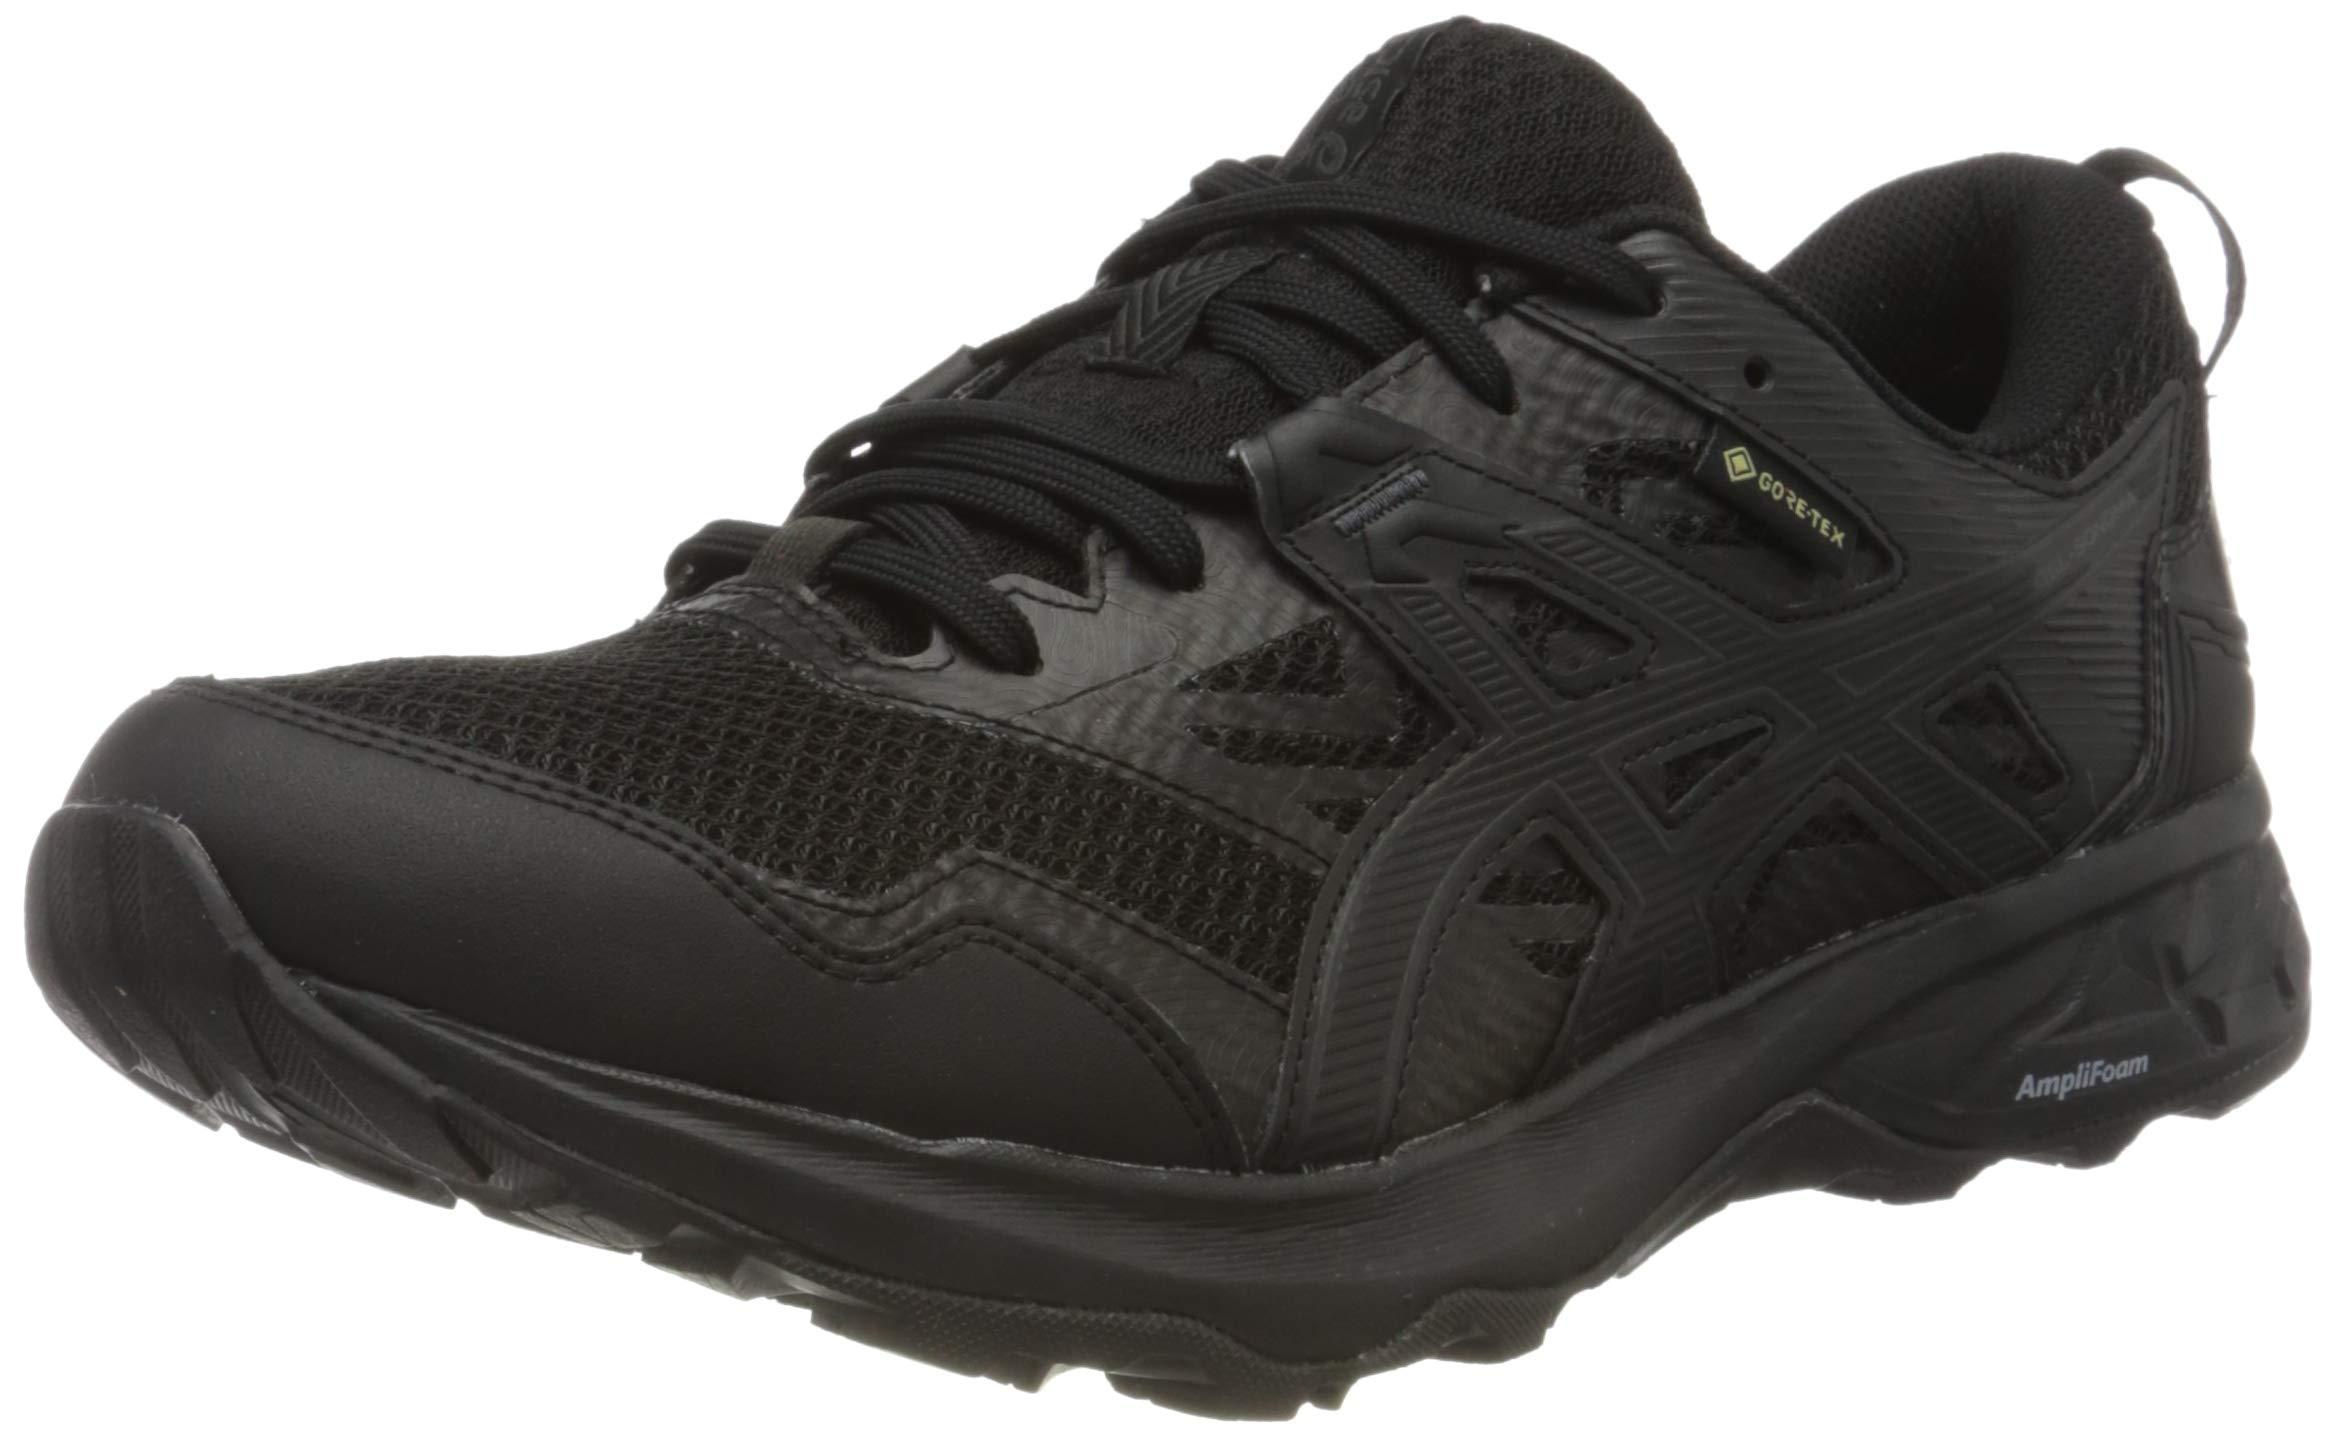 Asics Womens 1012A567-001_36 Trail Running Shoe - Black - 37.5 EU